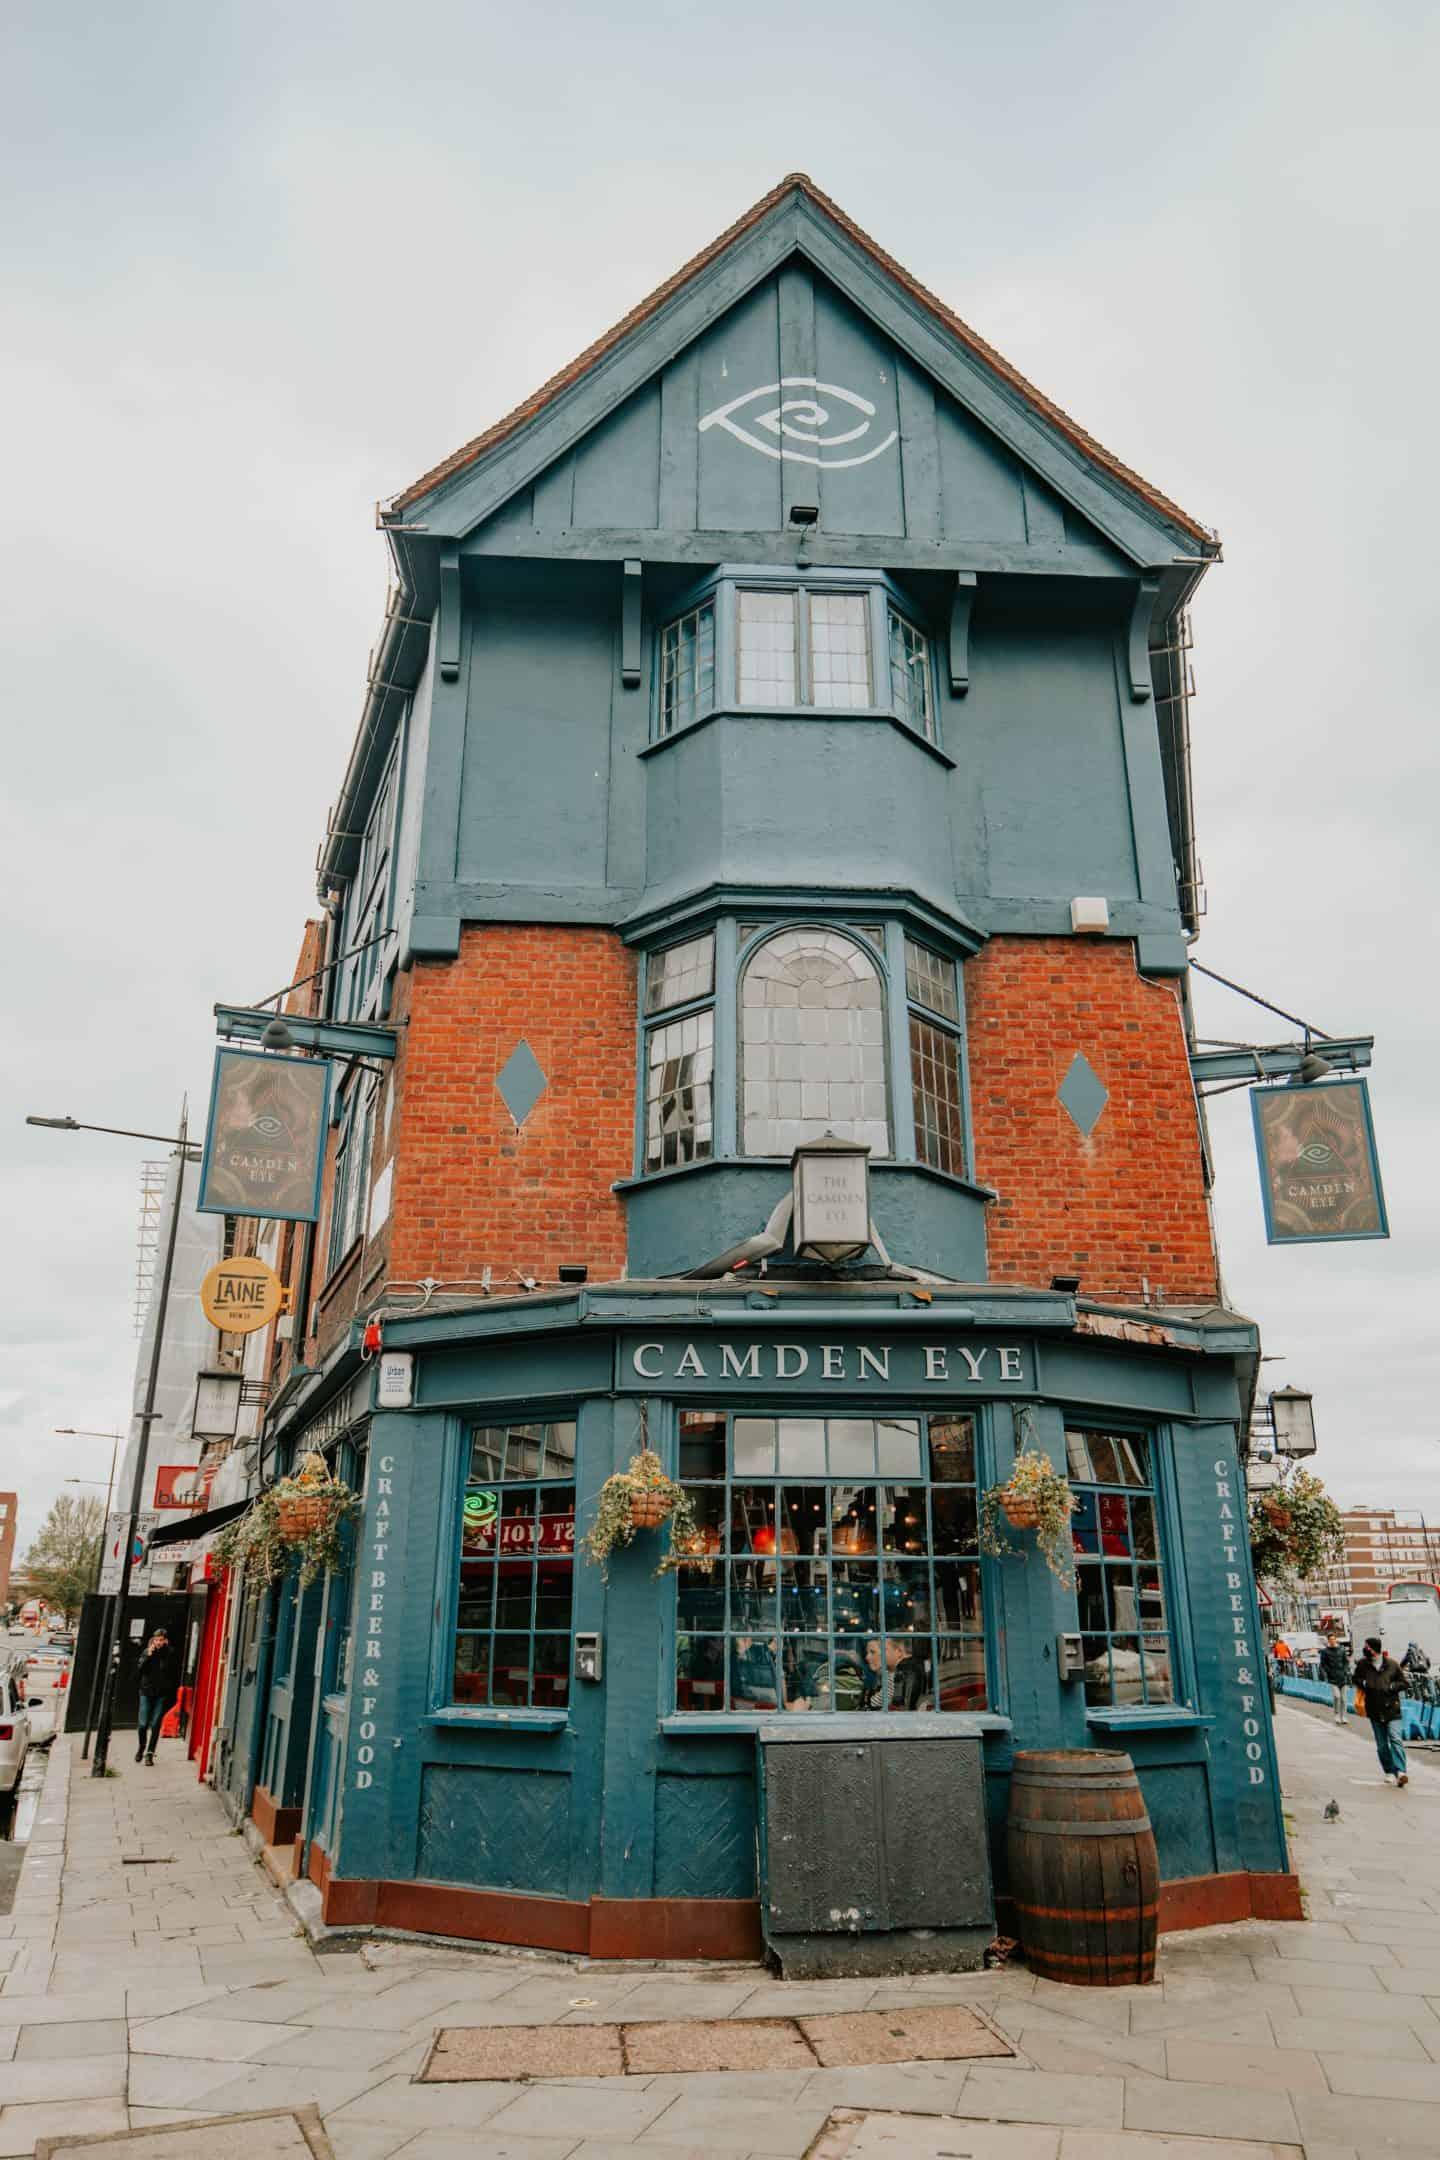 Camden Eye Pub